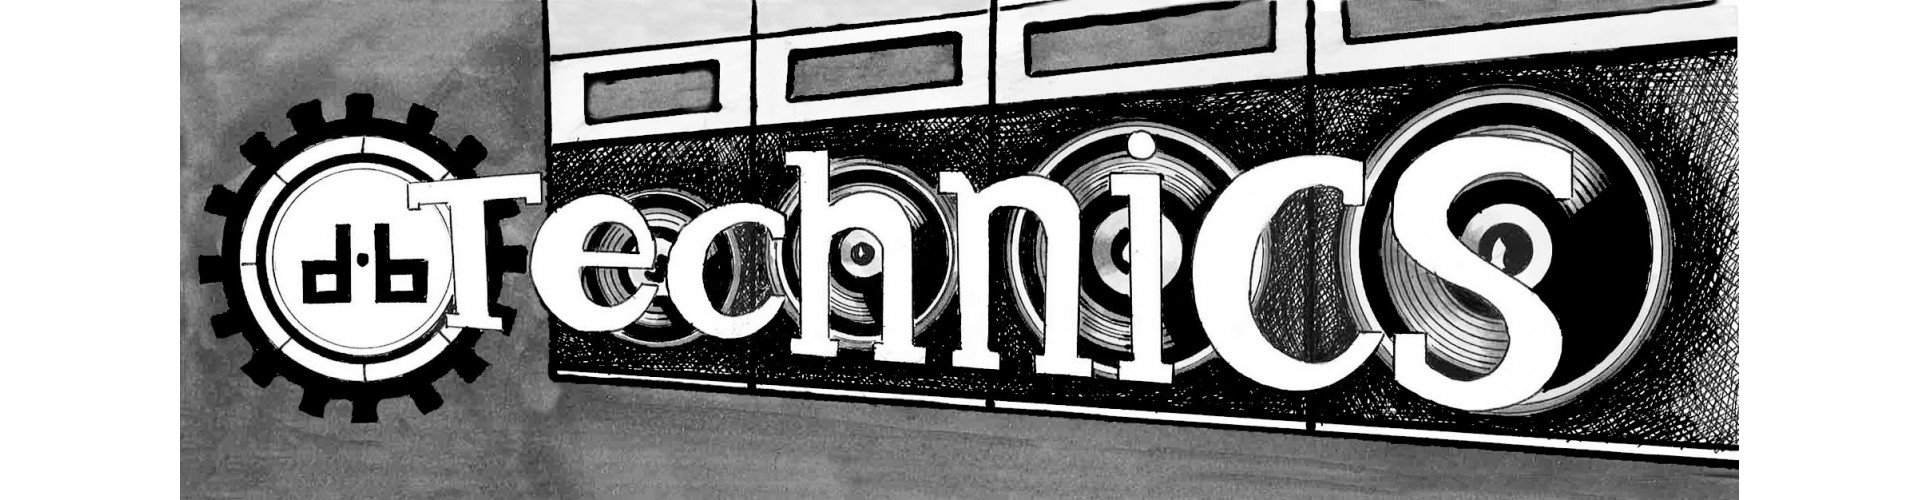 T-Shirt Technics Homme pas cher, tee shirt technics hi-fi original